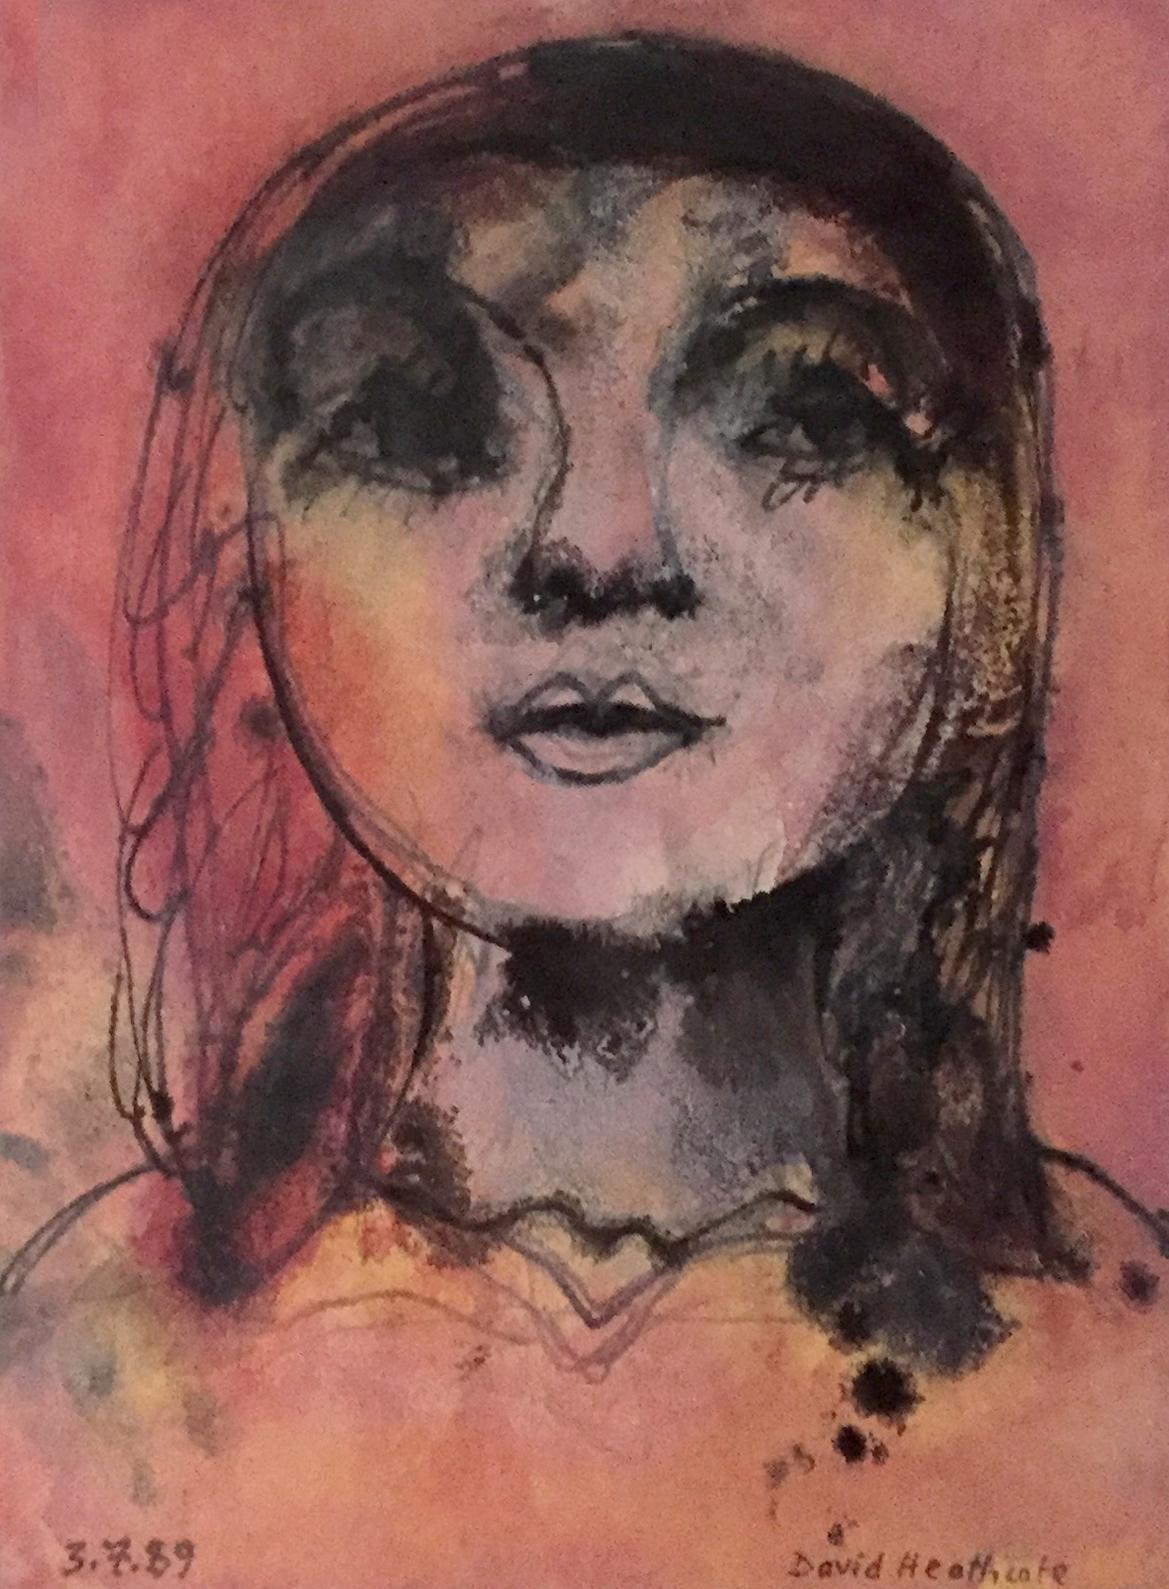 (C) David Heathcote  'Day Dreaming'  Mixed media on paper  15x11cm